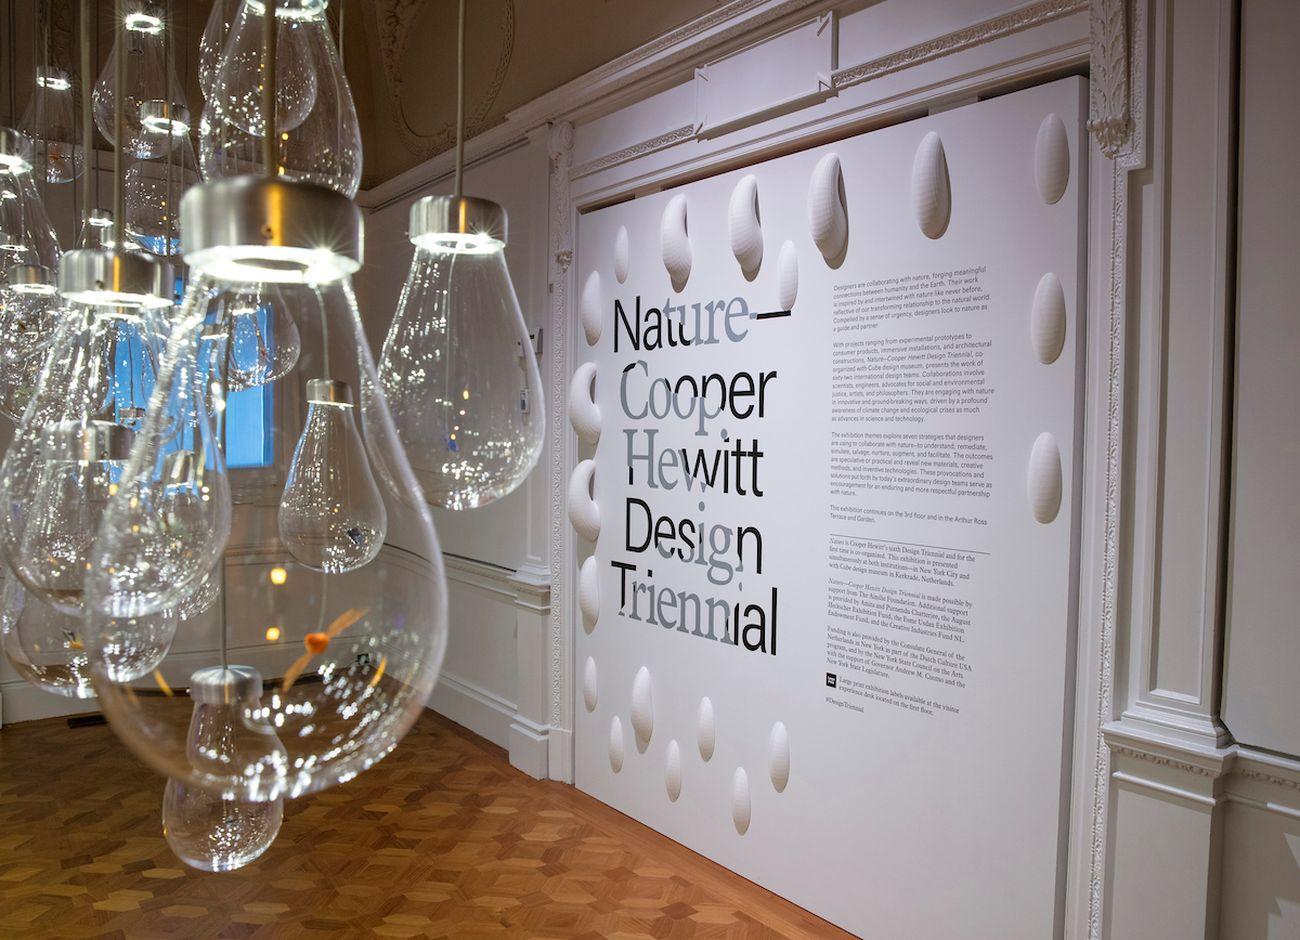 Nature. Cooper Hewitt Design Triennial 2019. Photo Matt Flynn © Smithsonian Institution